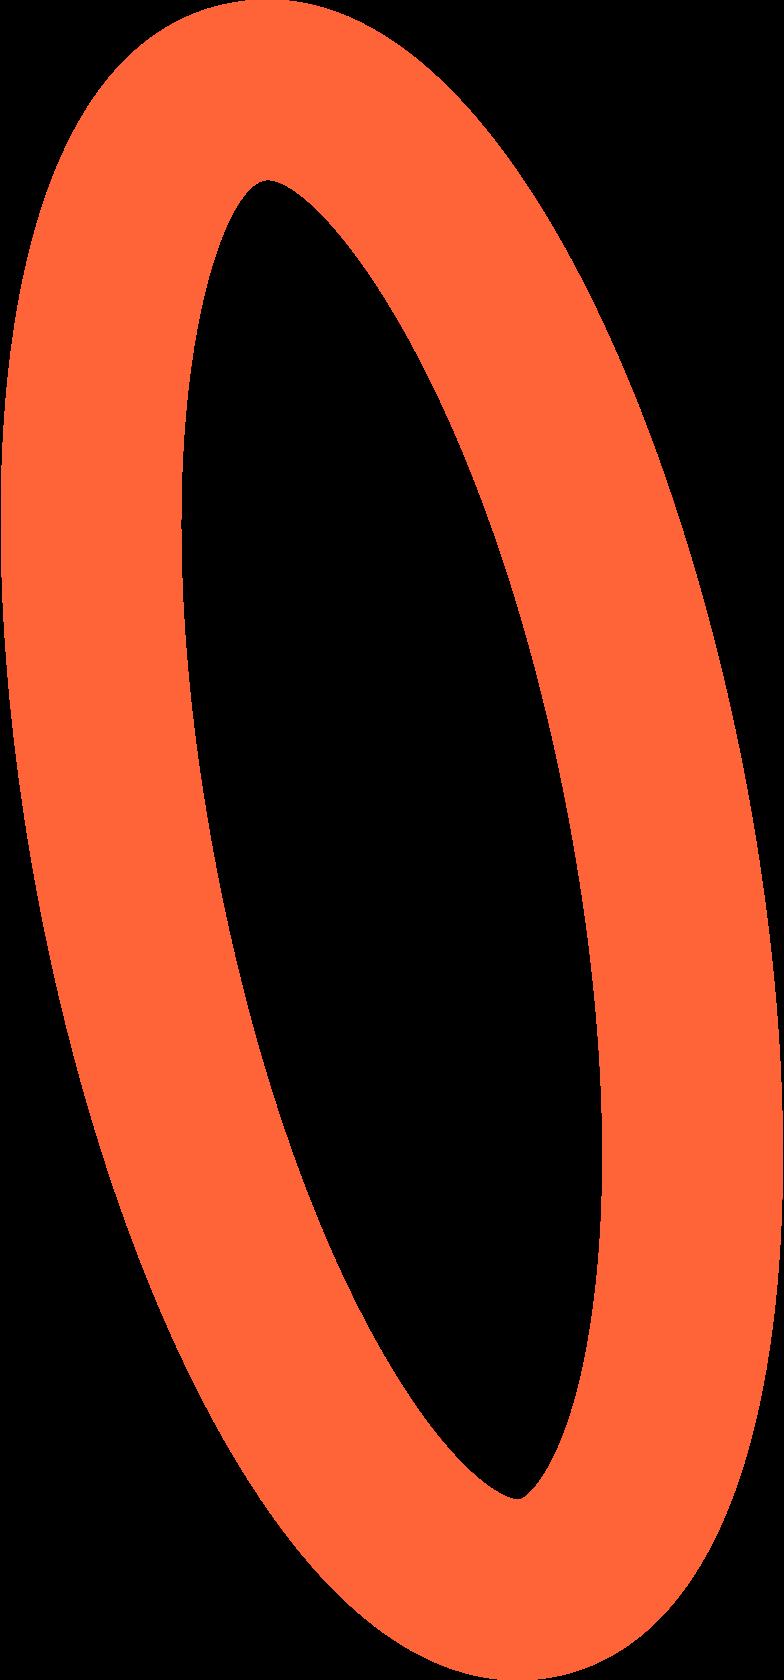 bad gateway  oval Clipart illustration in PNG, SVG